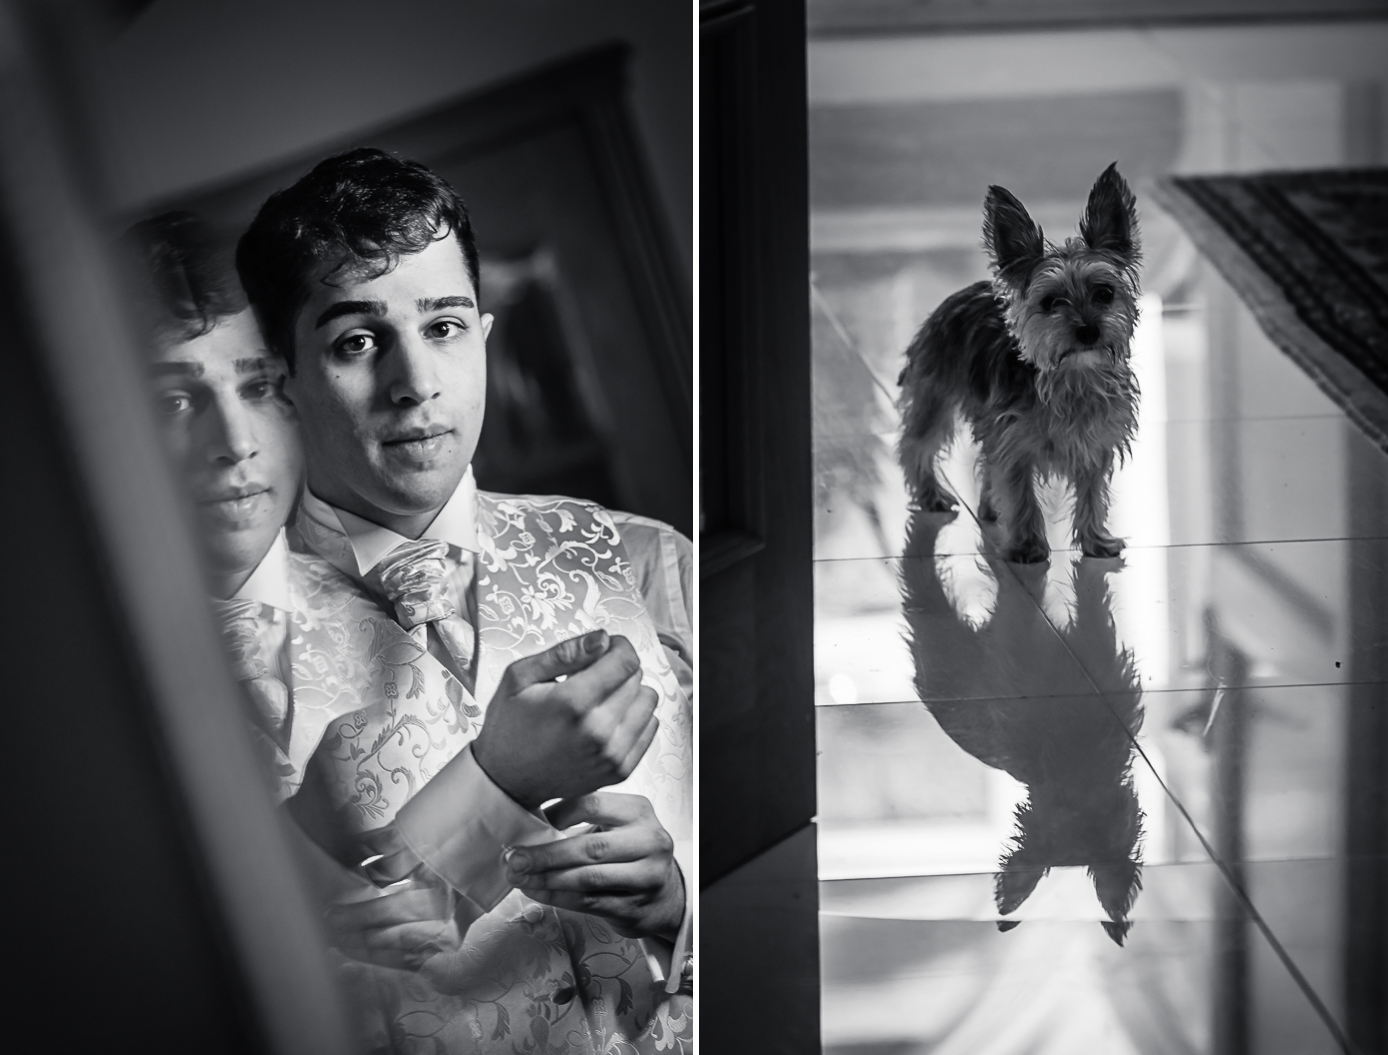 iranian wedding photographer 7 - Drapers Hall London Wedding Photographer